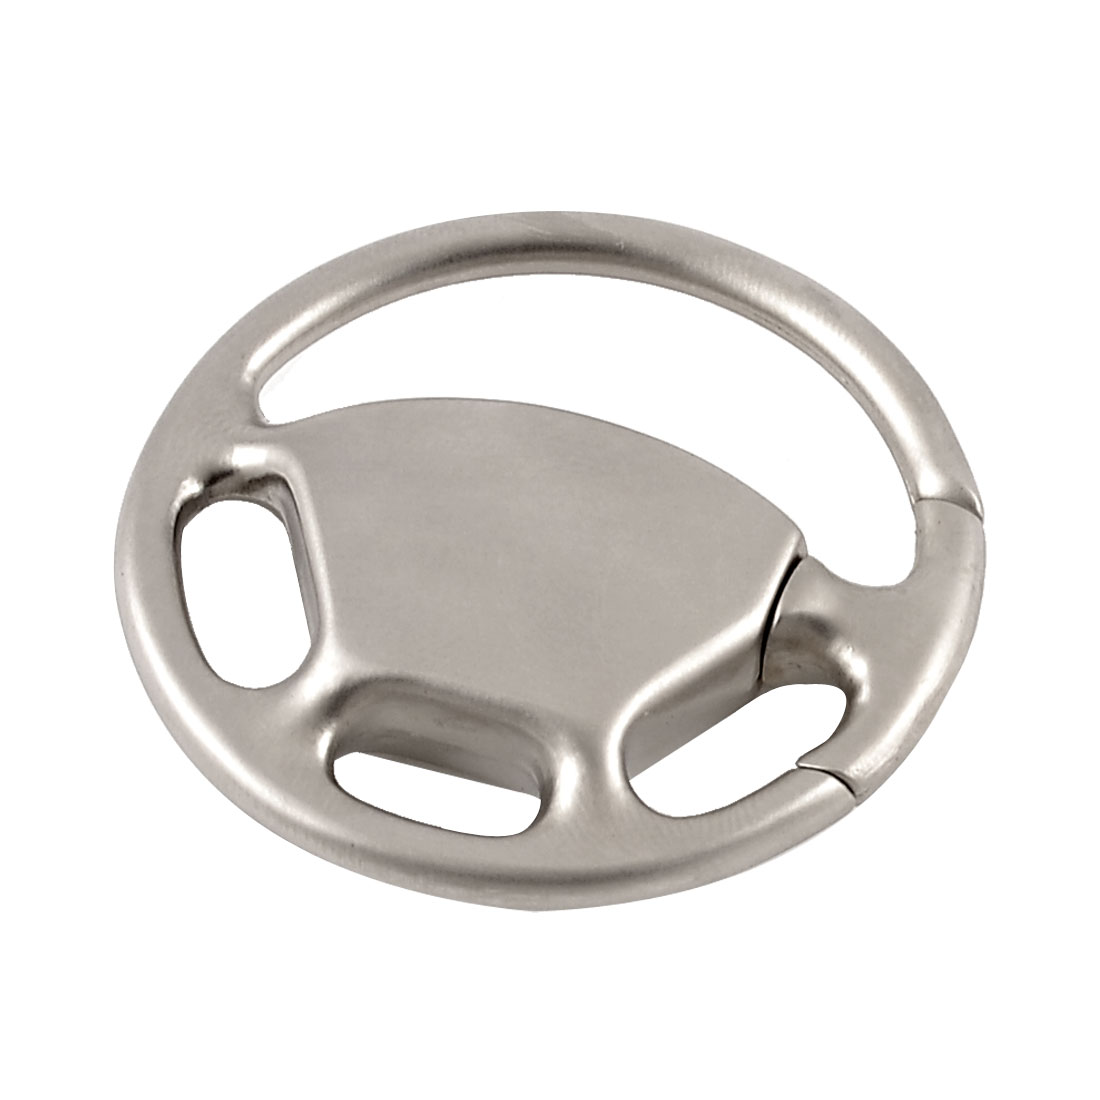 Alloy 42mm Dia Steering Wheel Keyring Keychain Decoration Silver Tone